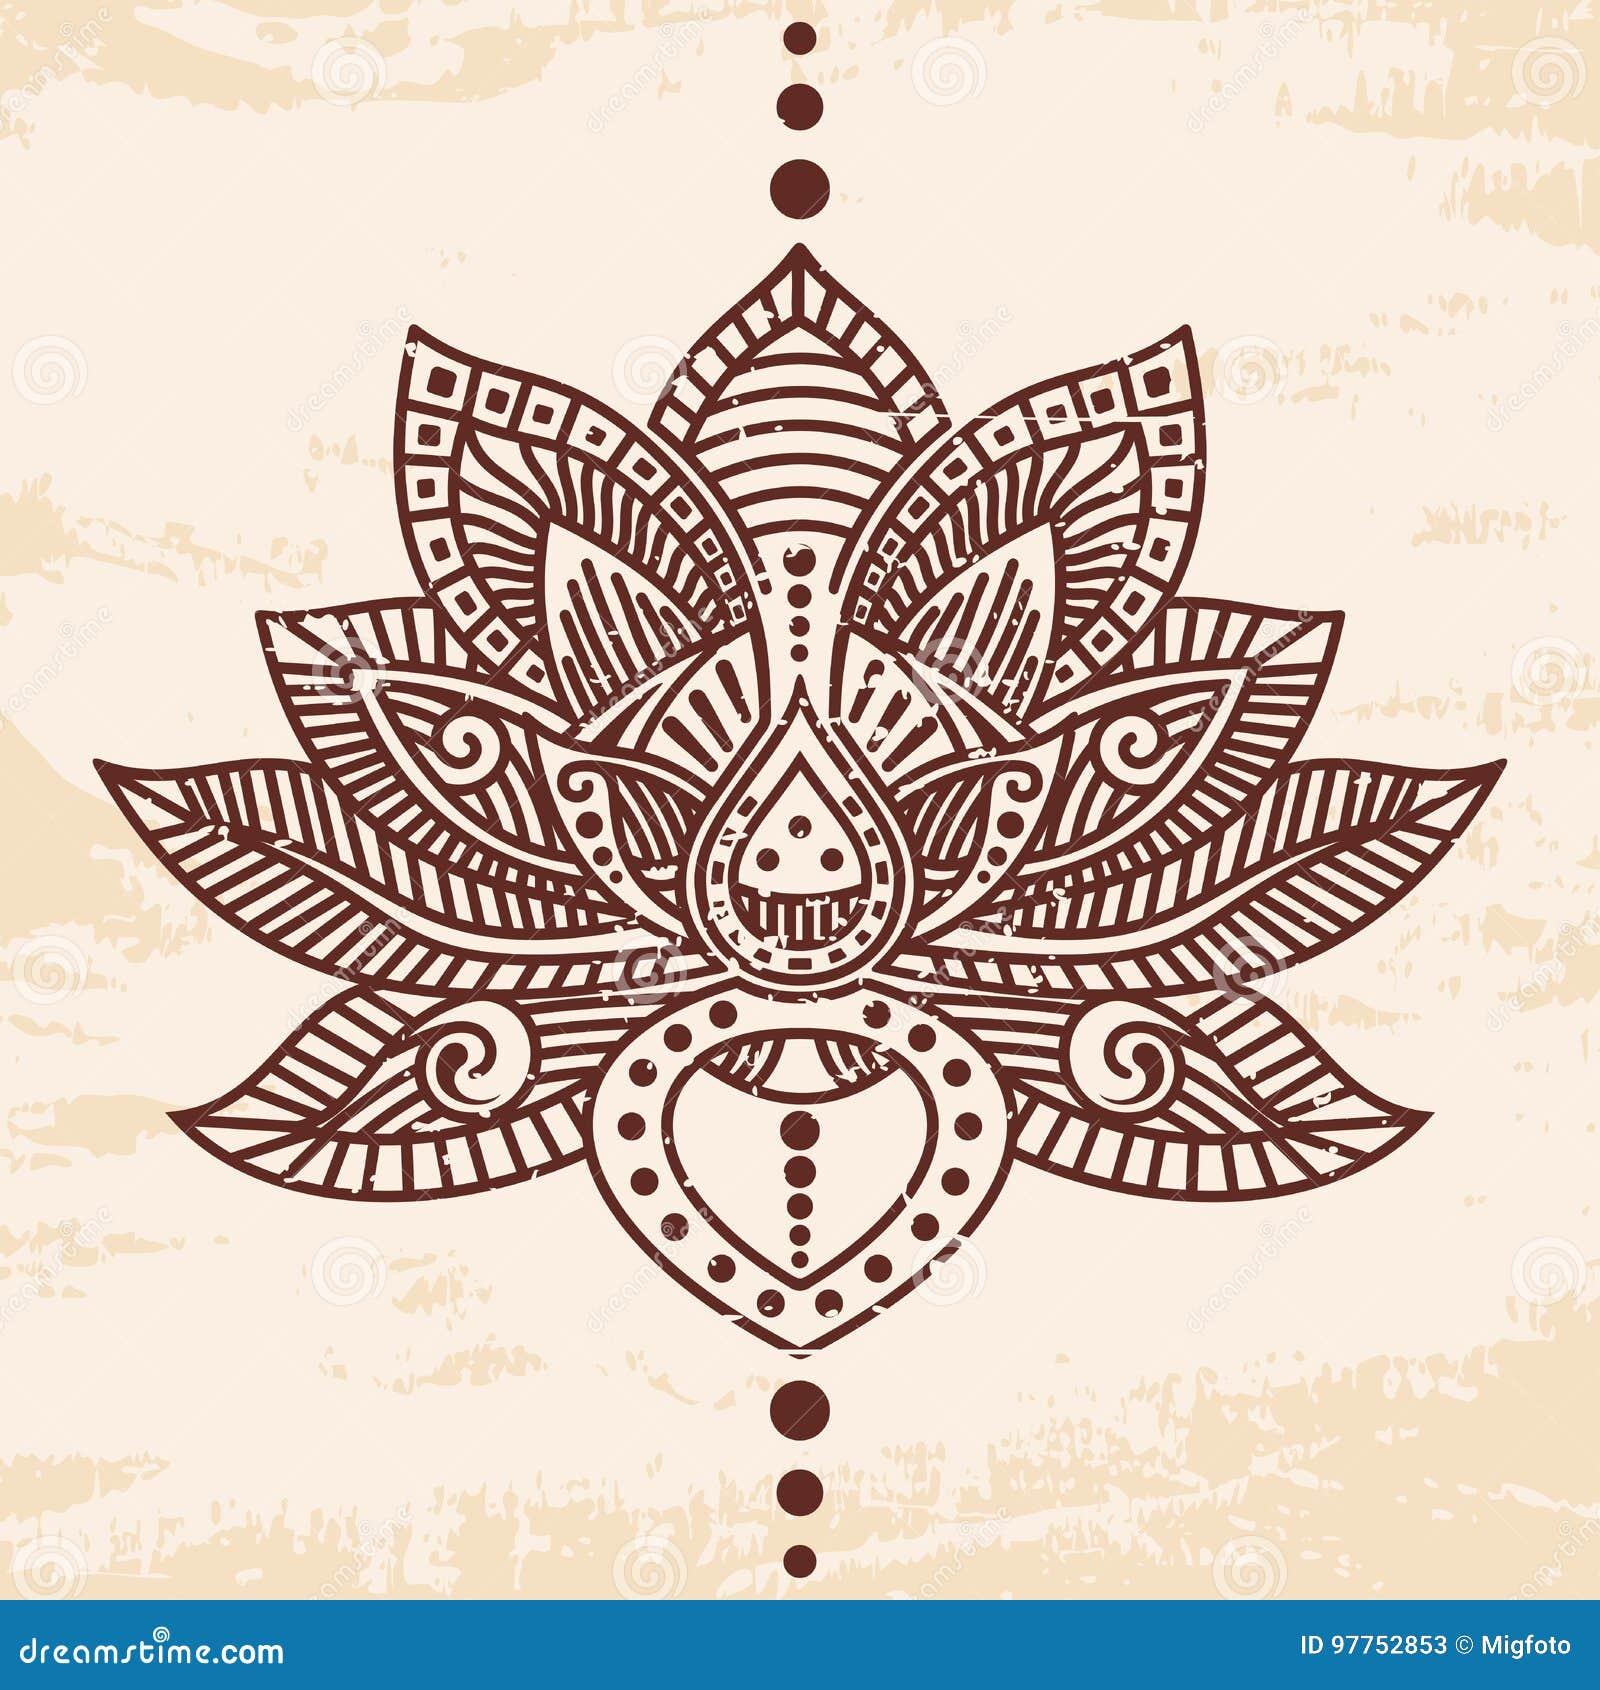 8ee5dd873 Lotus flower tattoo stock vector. Illustration of decoration - 97752853